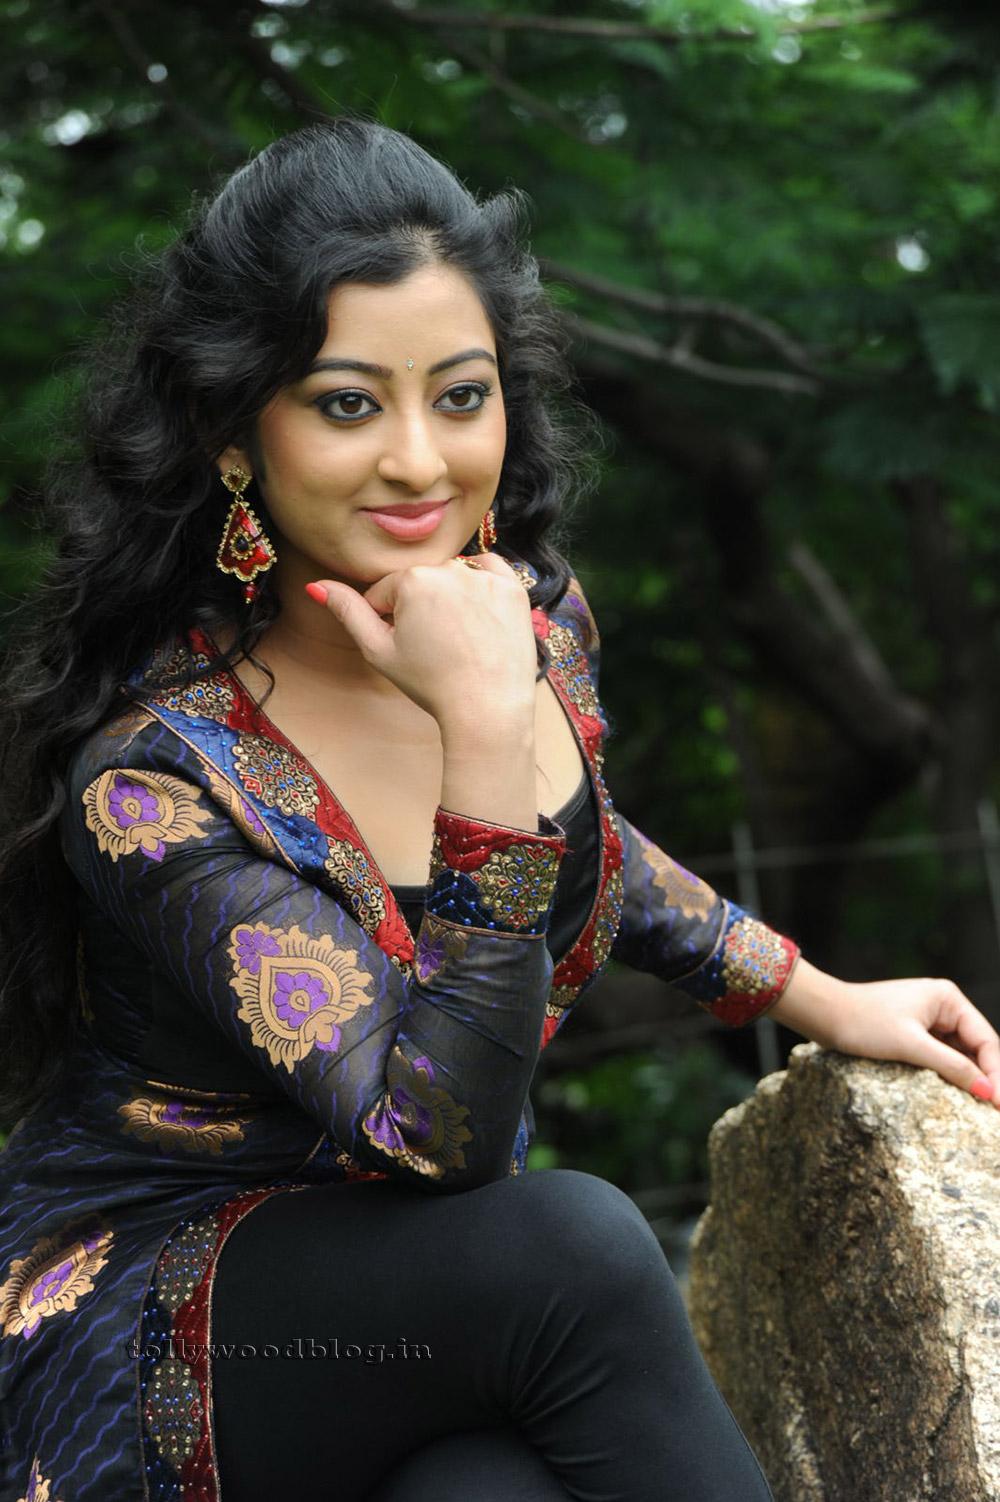 7 Days devotional telugu mp3 Songs Subbulakshmi